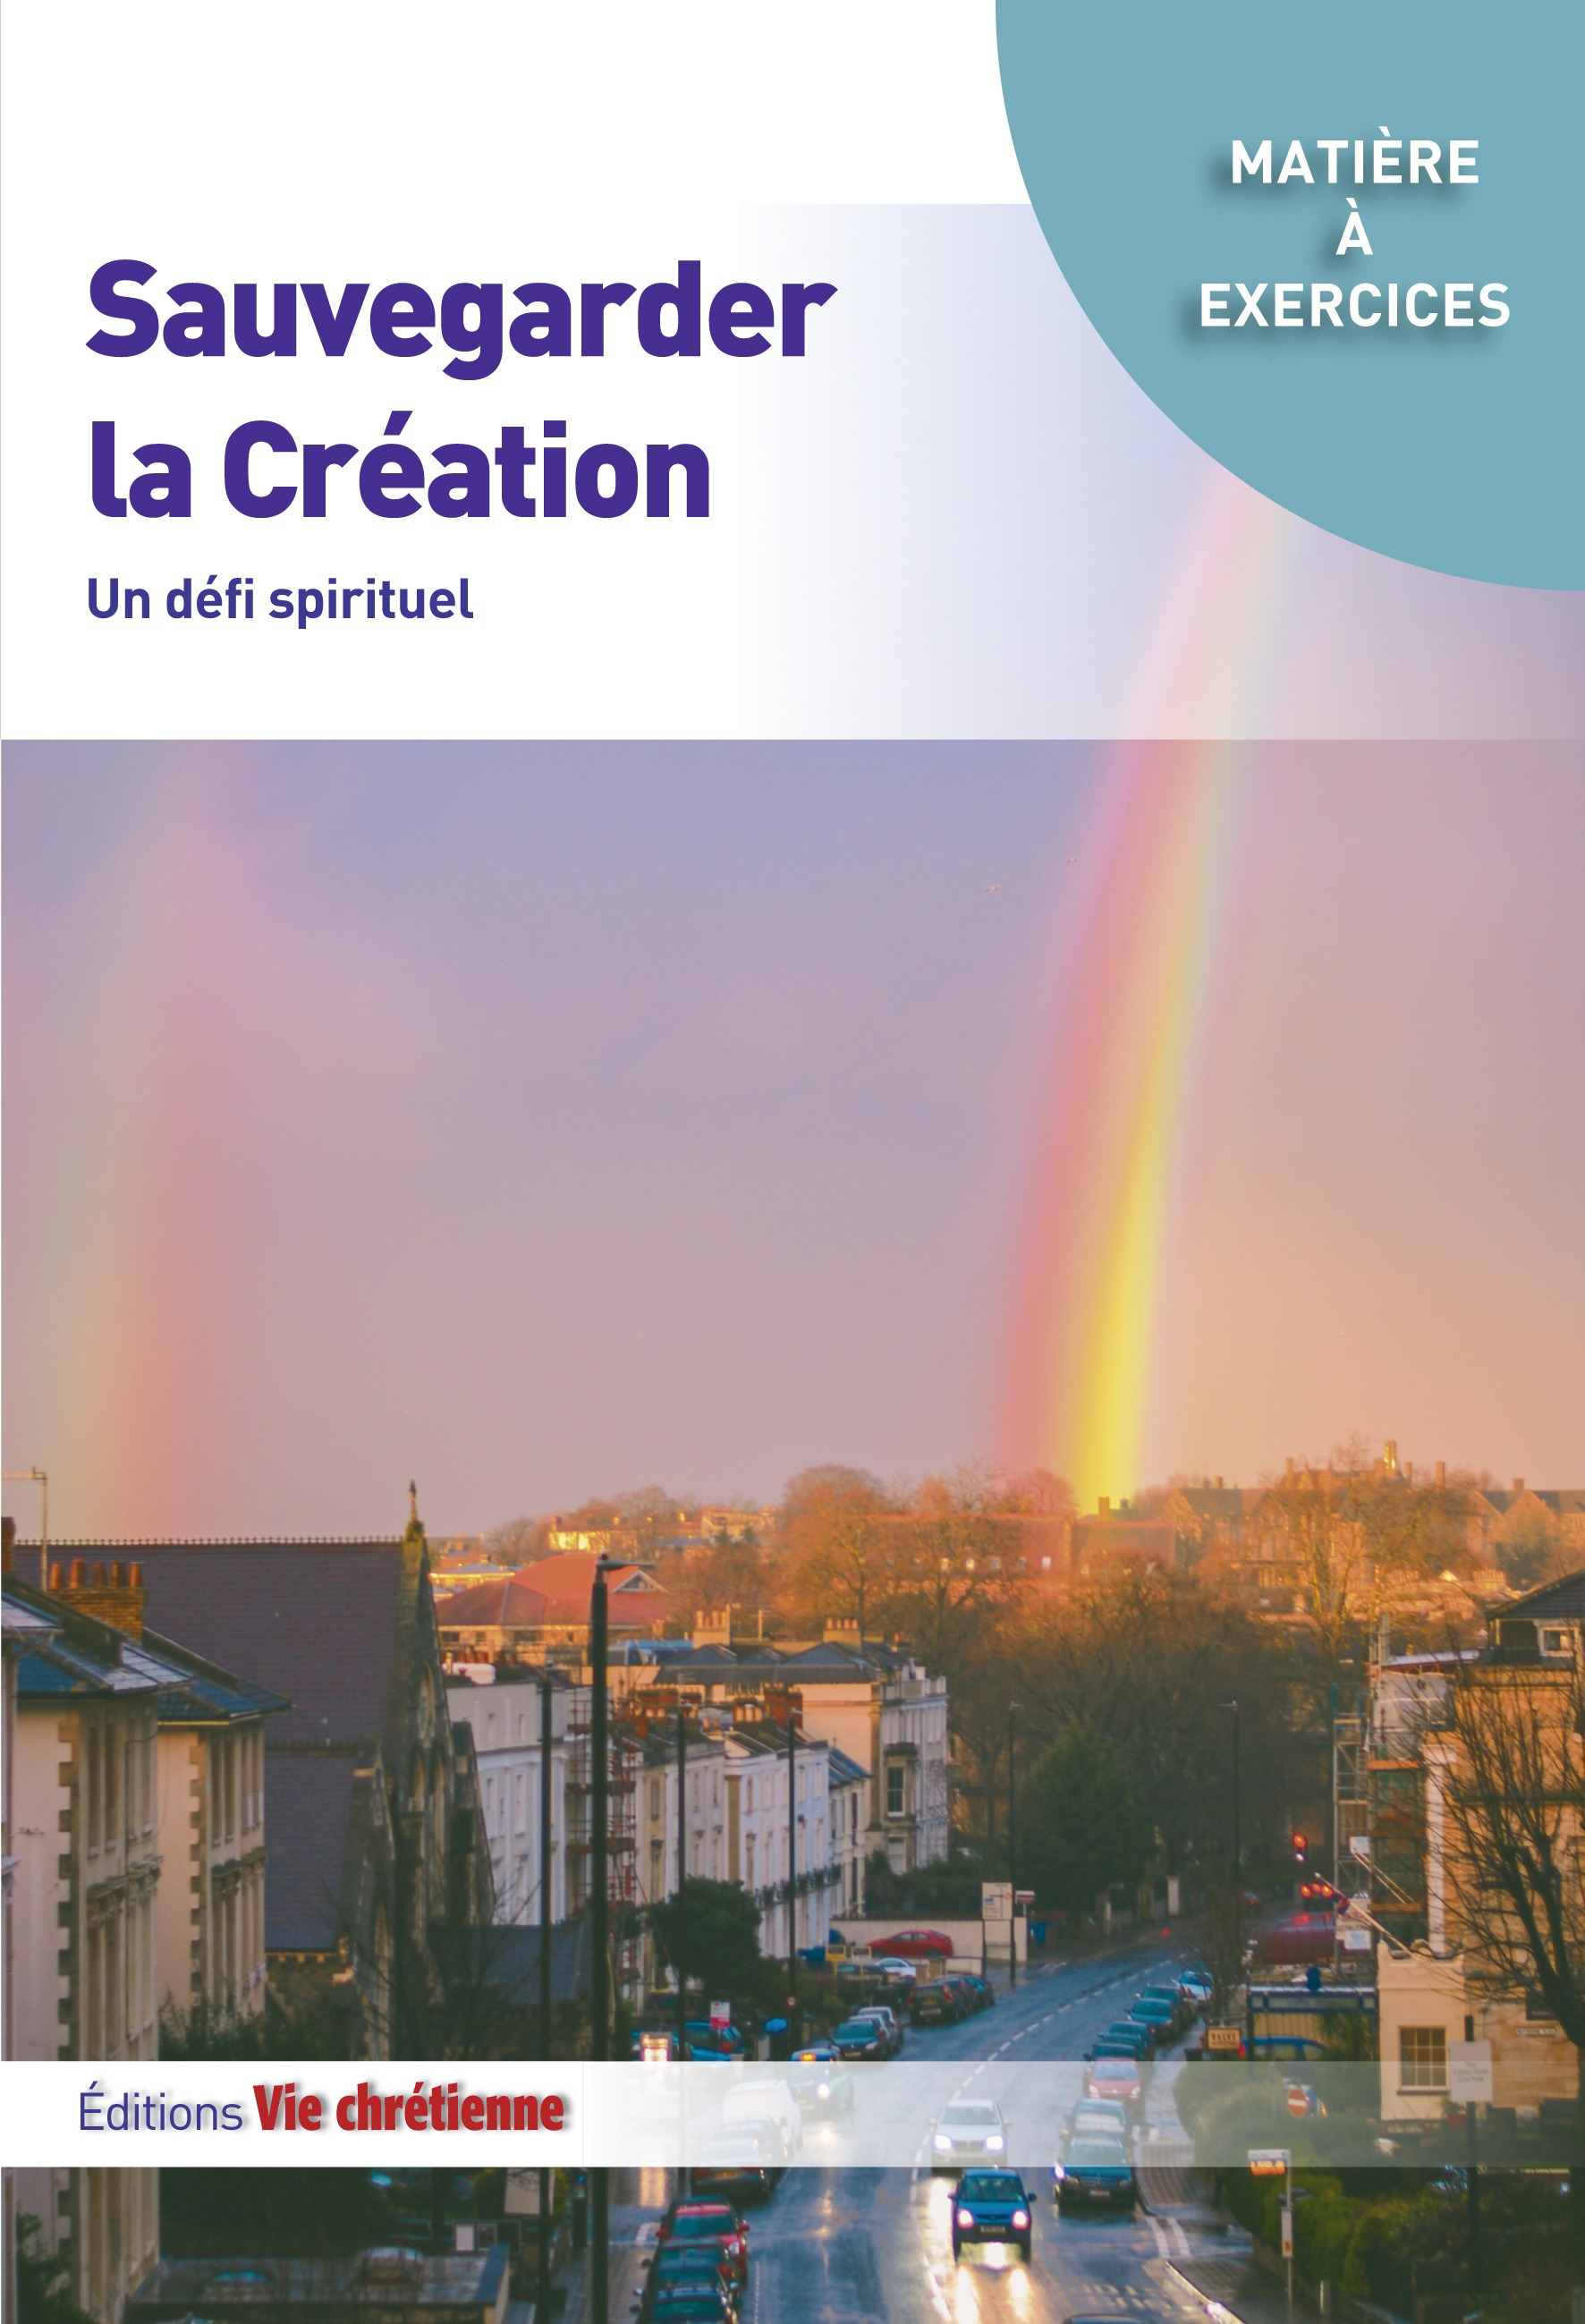 Sauvegarder la creation. un defi spirituel